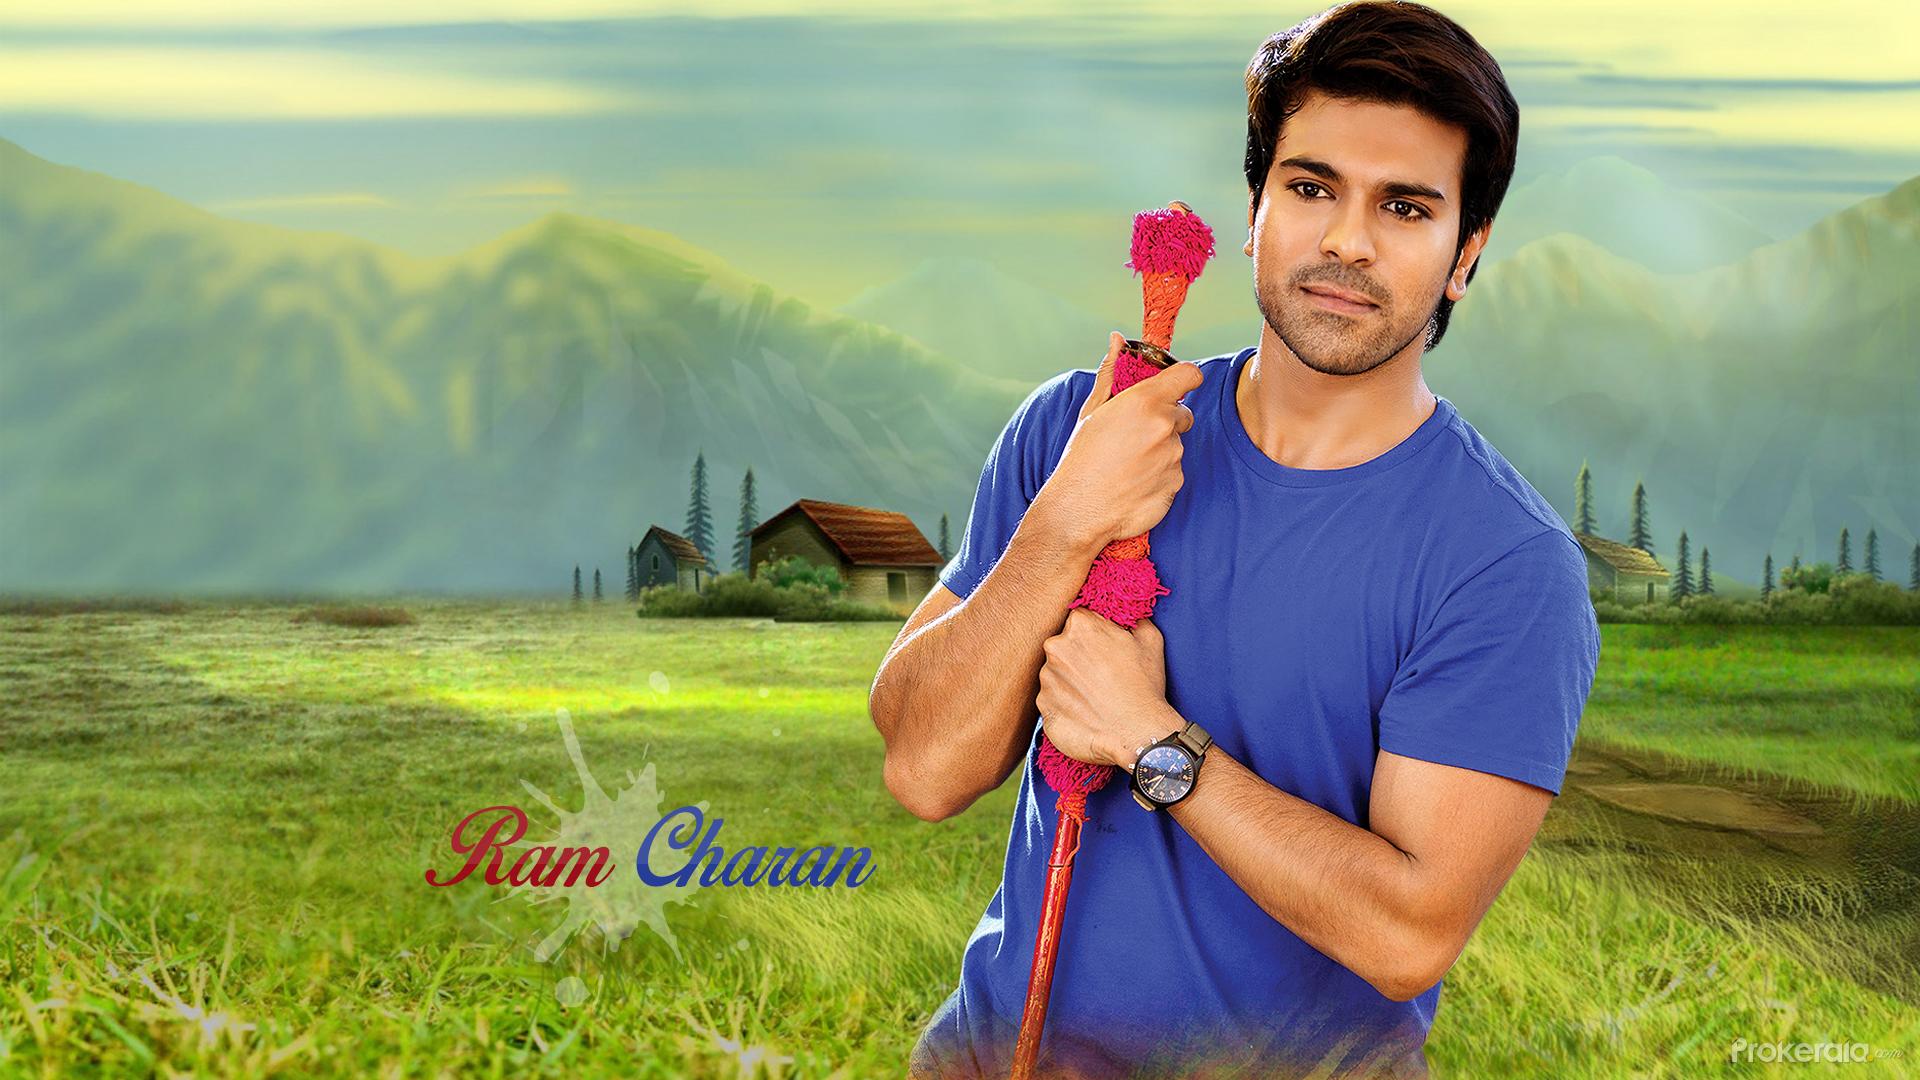 Ram Charan Hd Wallpapers